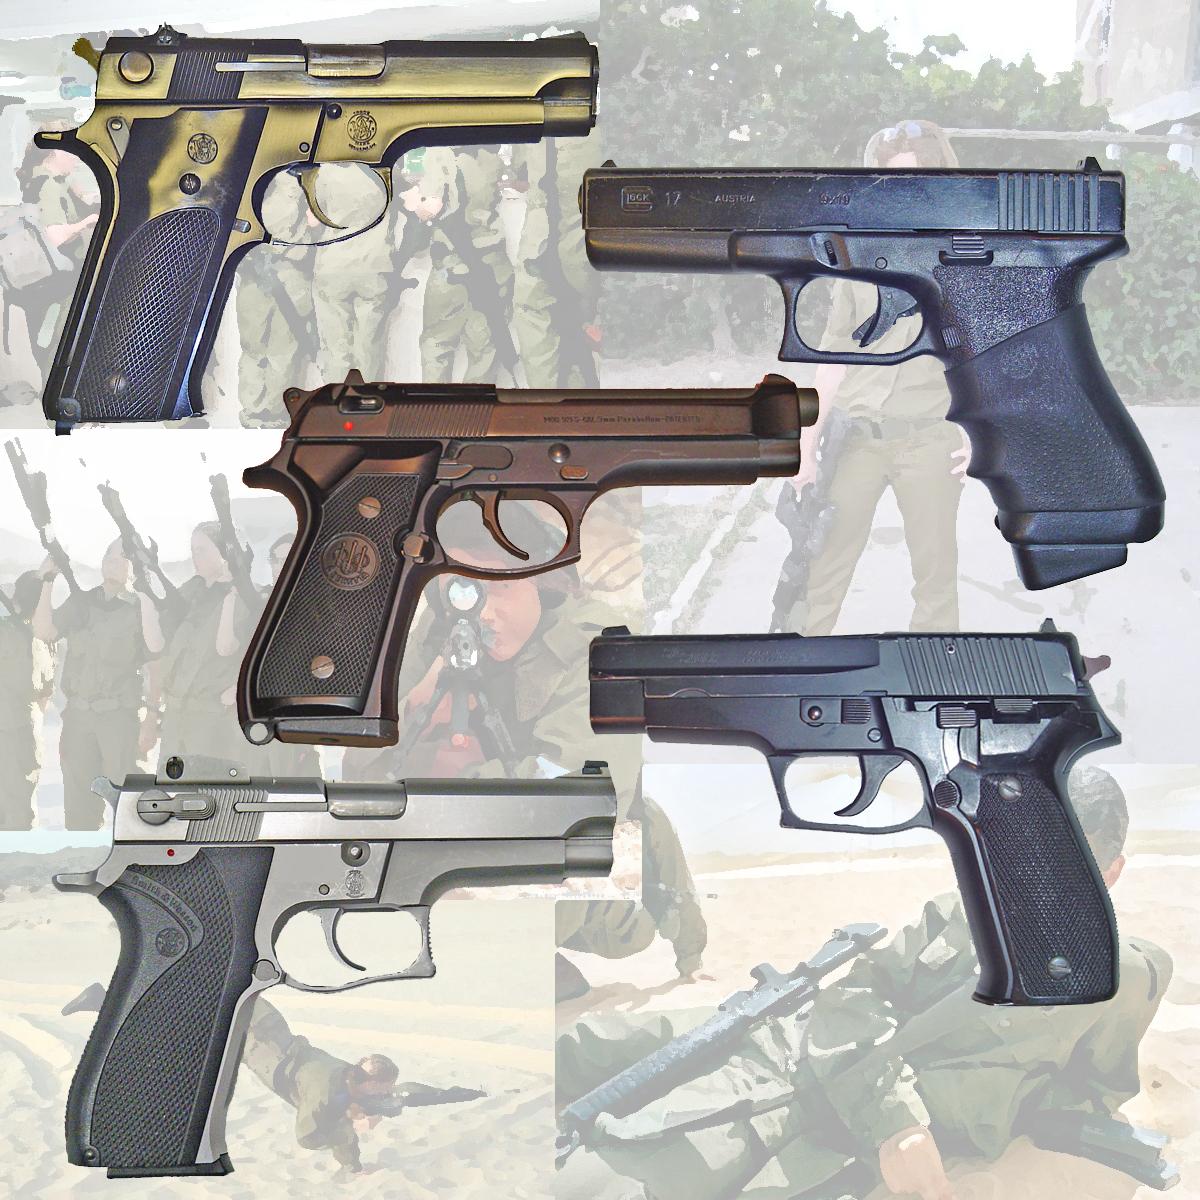 9mm Handguns by AbbyNormL